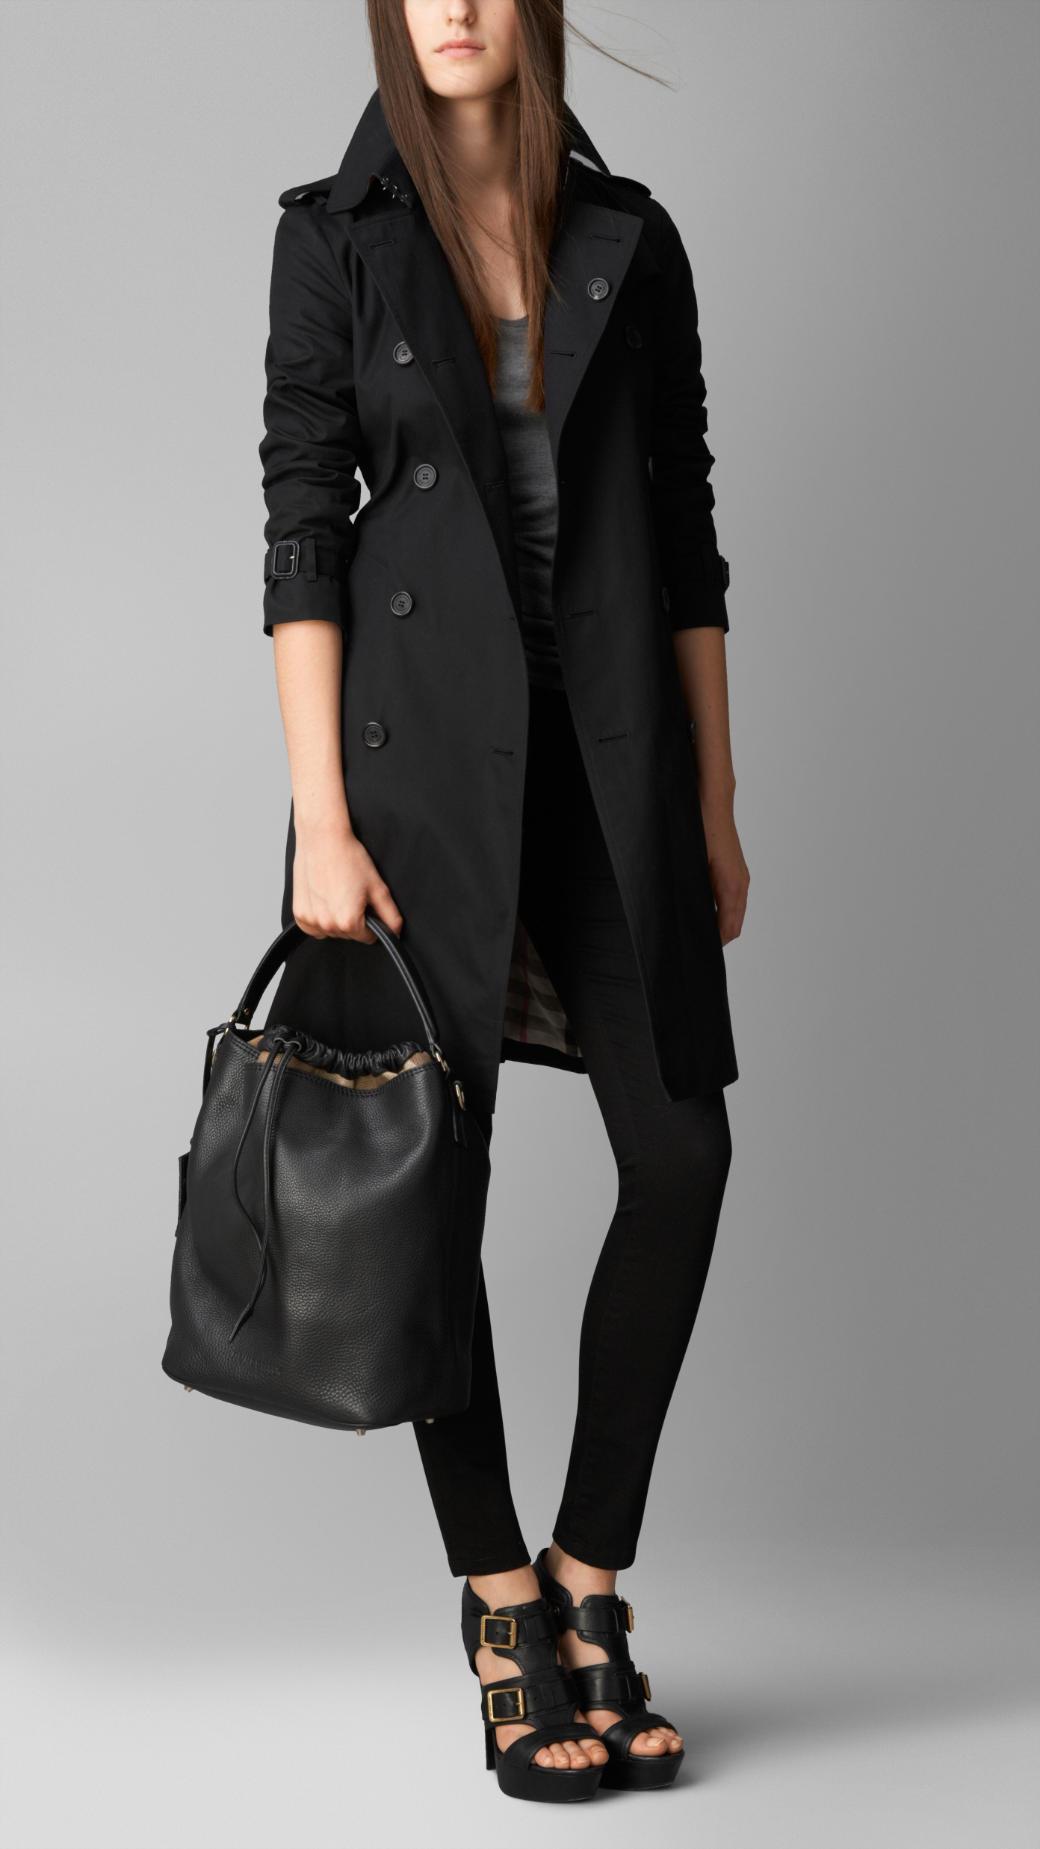 Lyst burberry the medium ashby leather hobo in black jpg 1040x1849 Burberry  ashby medium bcef003e50c46